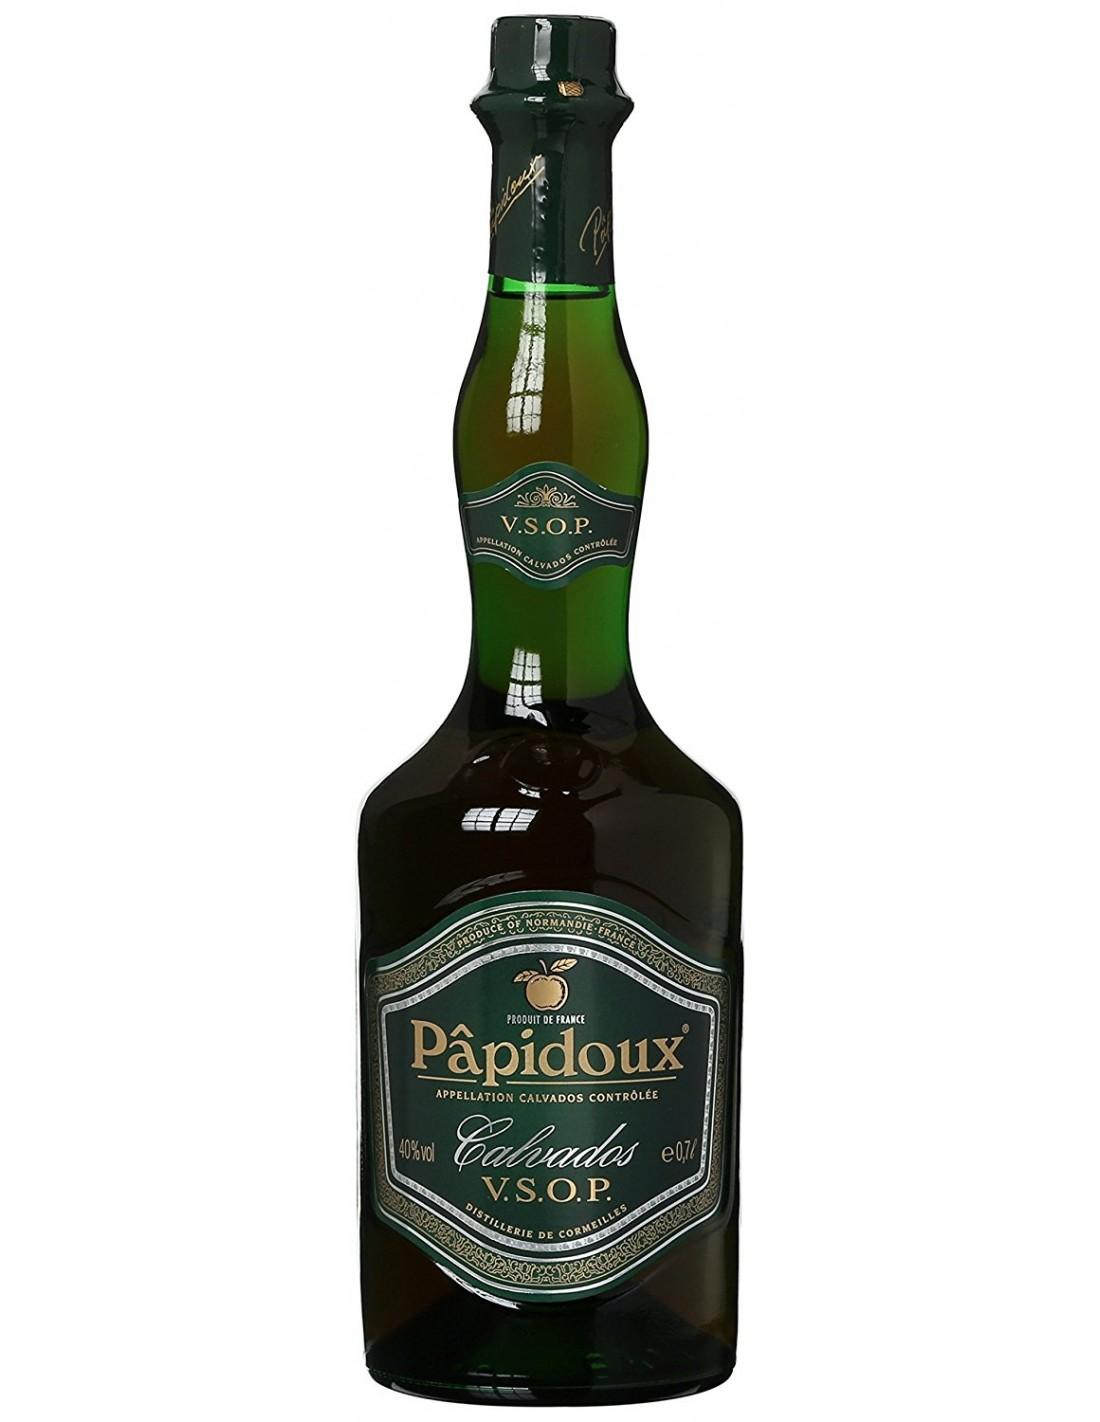 Brandy Calvados Papidoux VSOP 40% alc., 0.7L, Franta